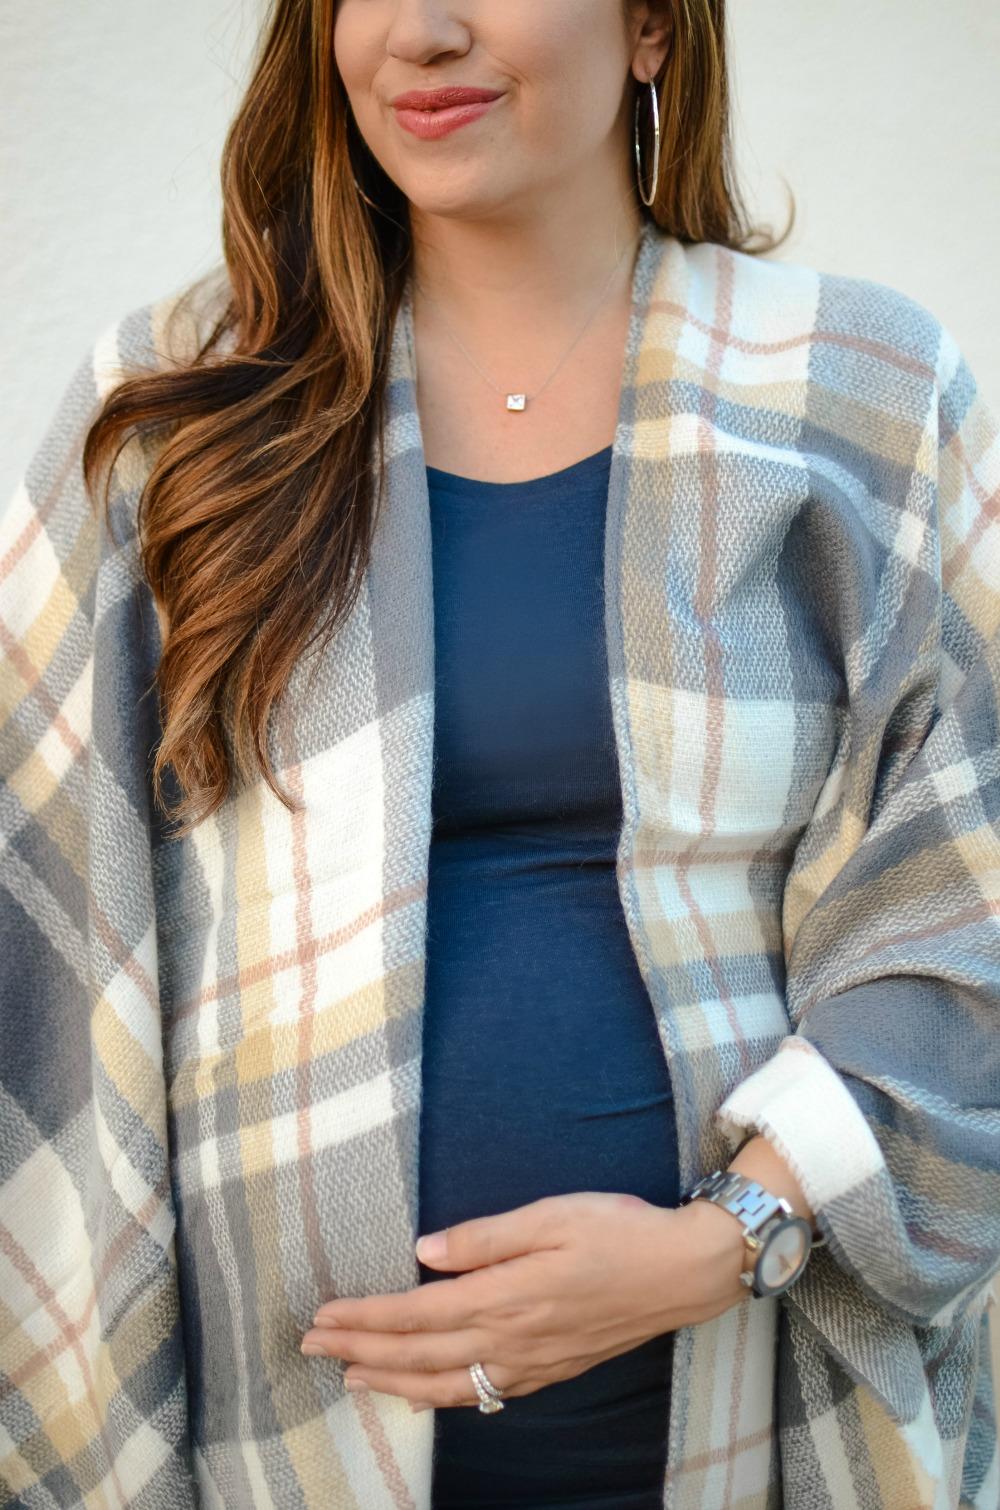 plaid scarf poncho, plaid blanket scarf,  Argento vivo jewelry, cotton body con dress, maternity style